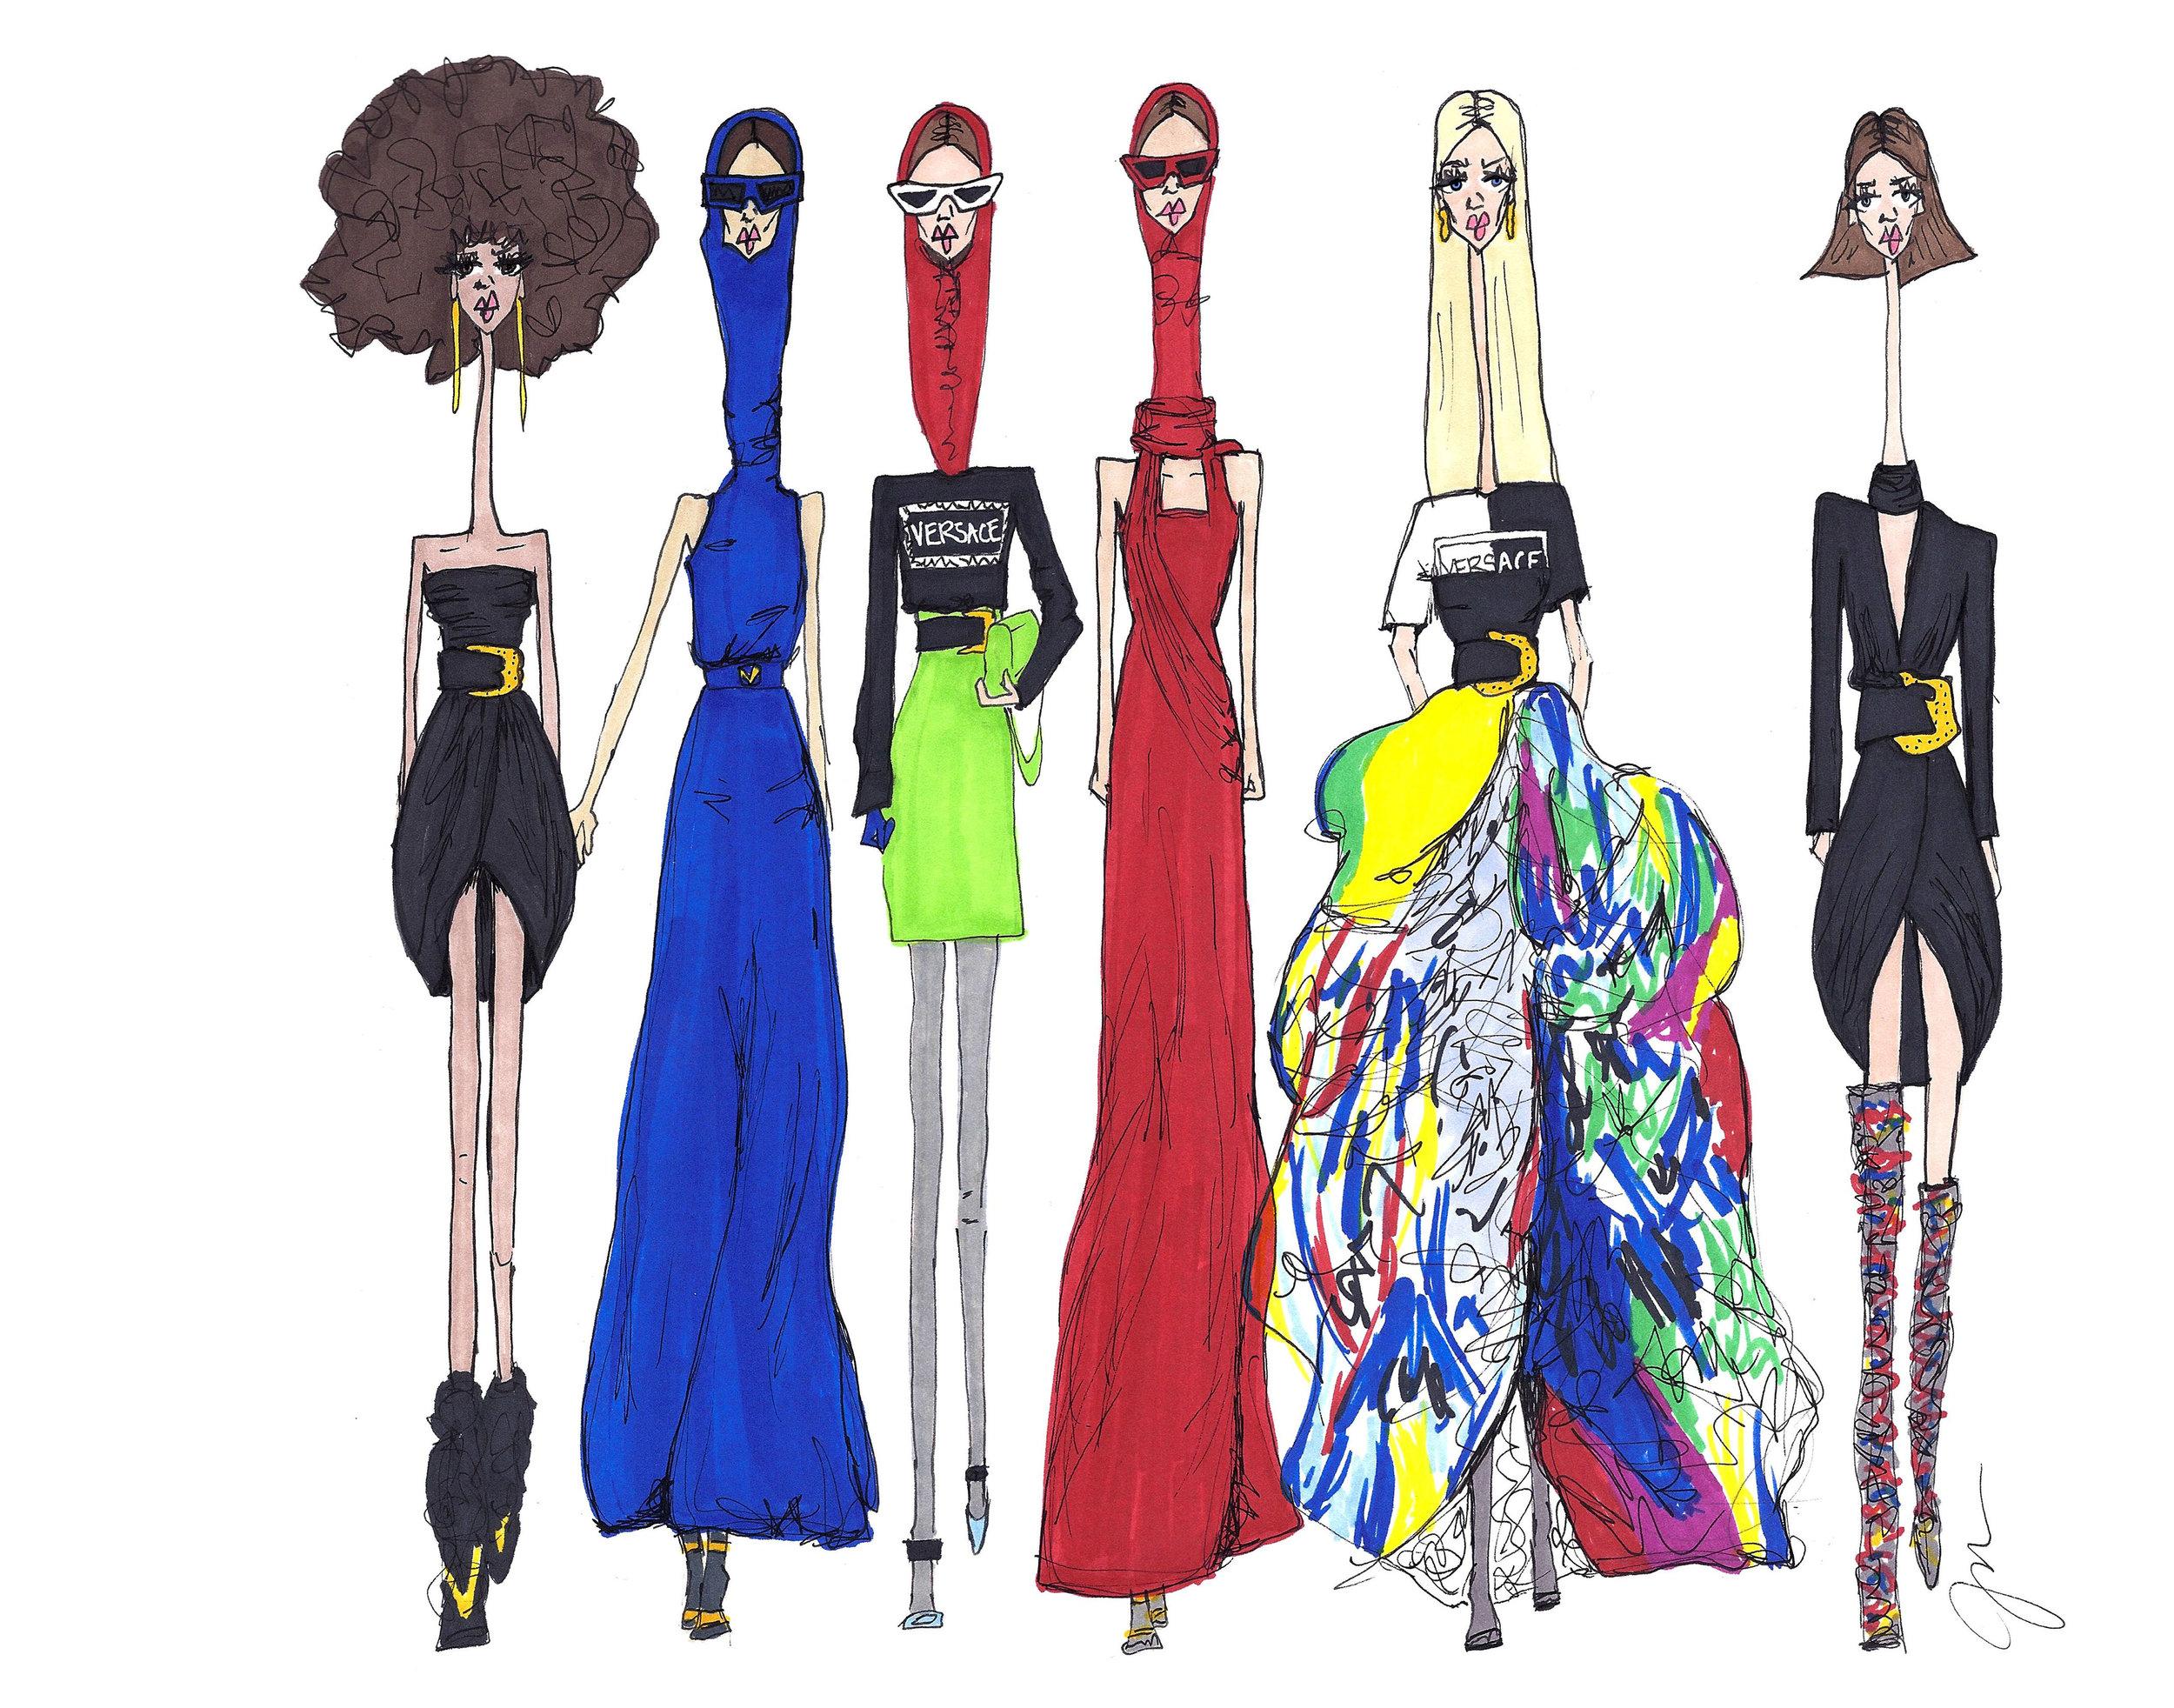 versace-2018-all.jpg